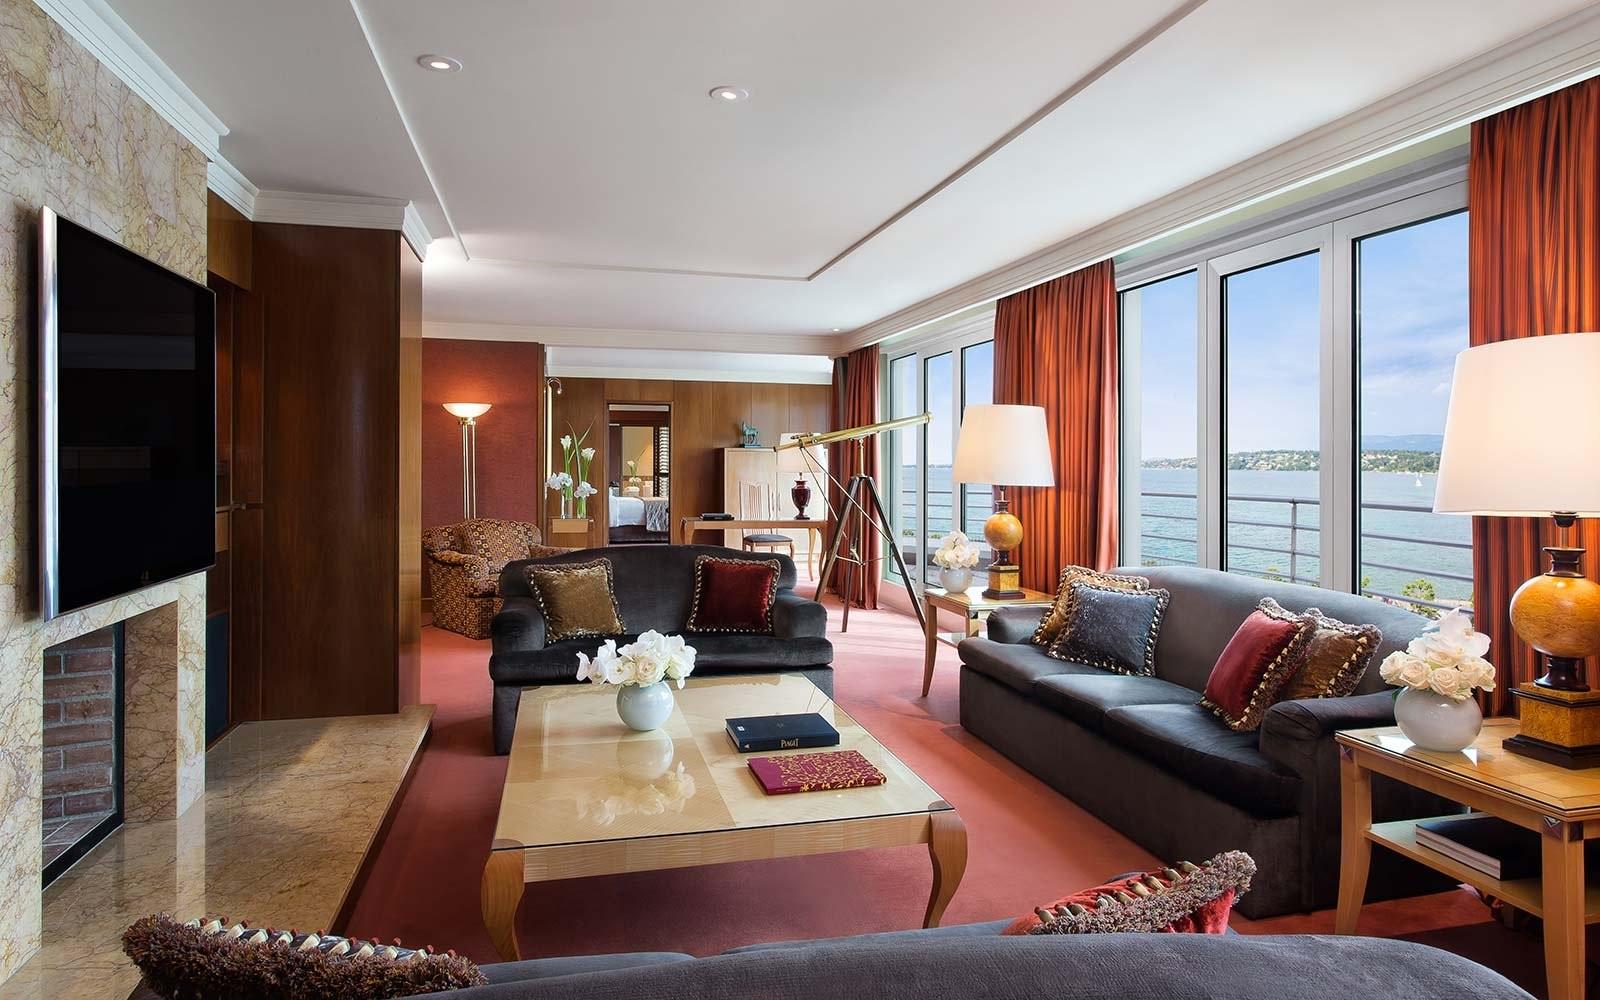 sitting-room-hotel-president-wilson-geneva-expensivesuite1017